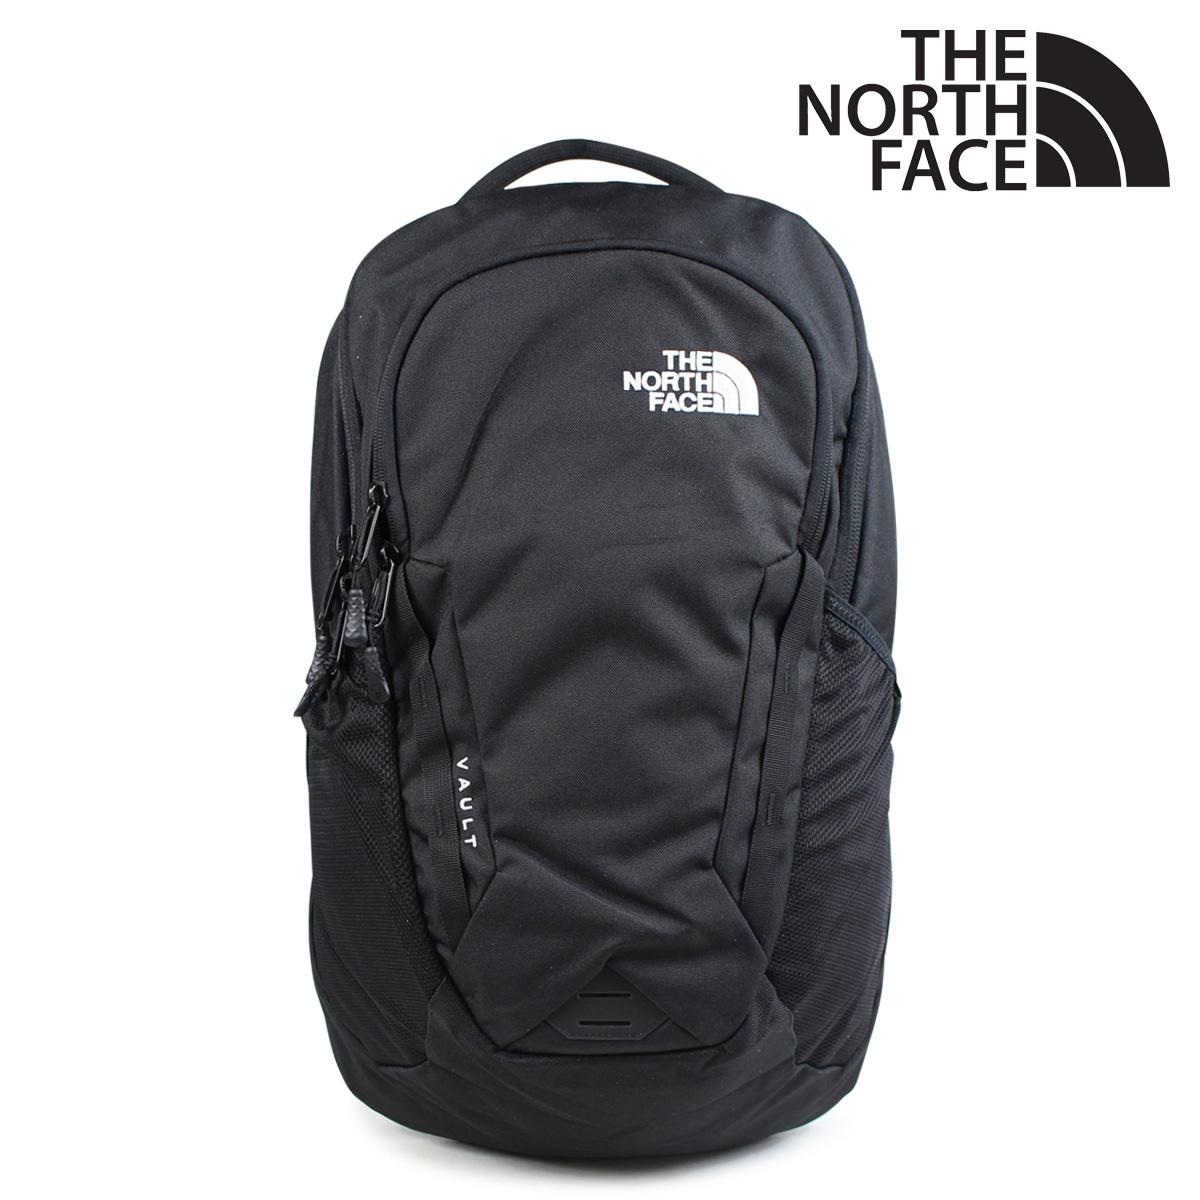 THE NORTH FACE VAULT ザノースフェイス リュック メンズ バックパック T93KV9JK3 ブラック [予約商品 4/10頃入荷予定 再入荷]